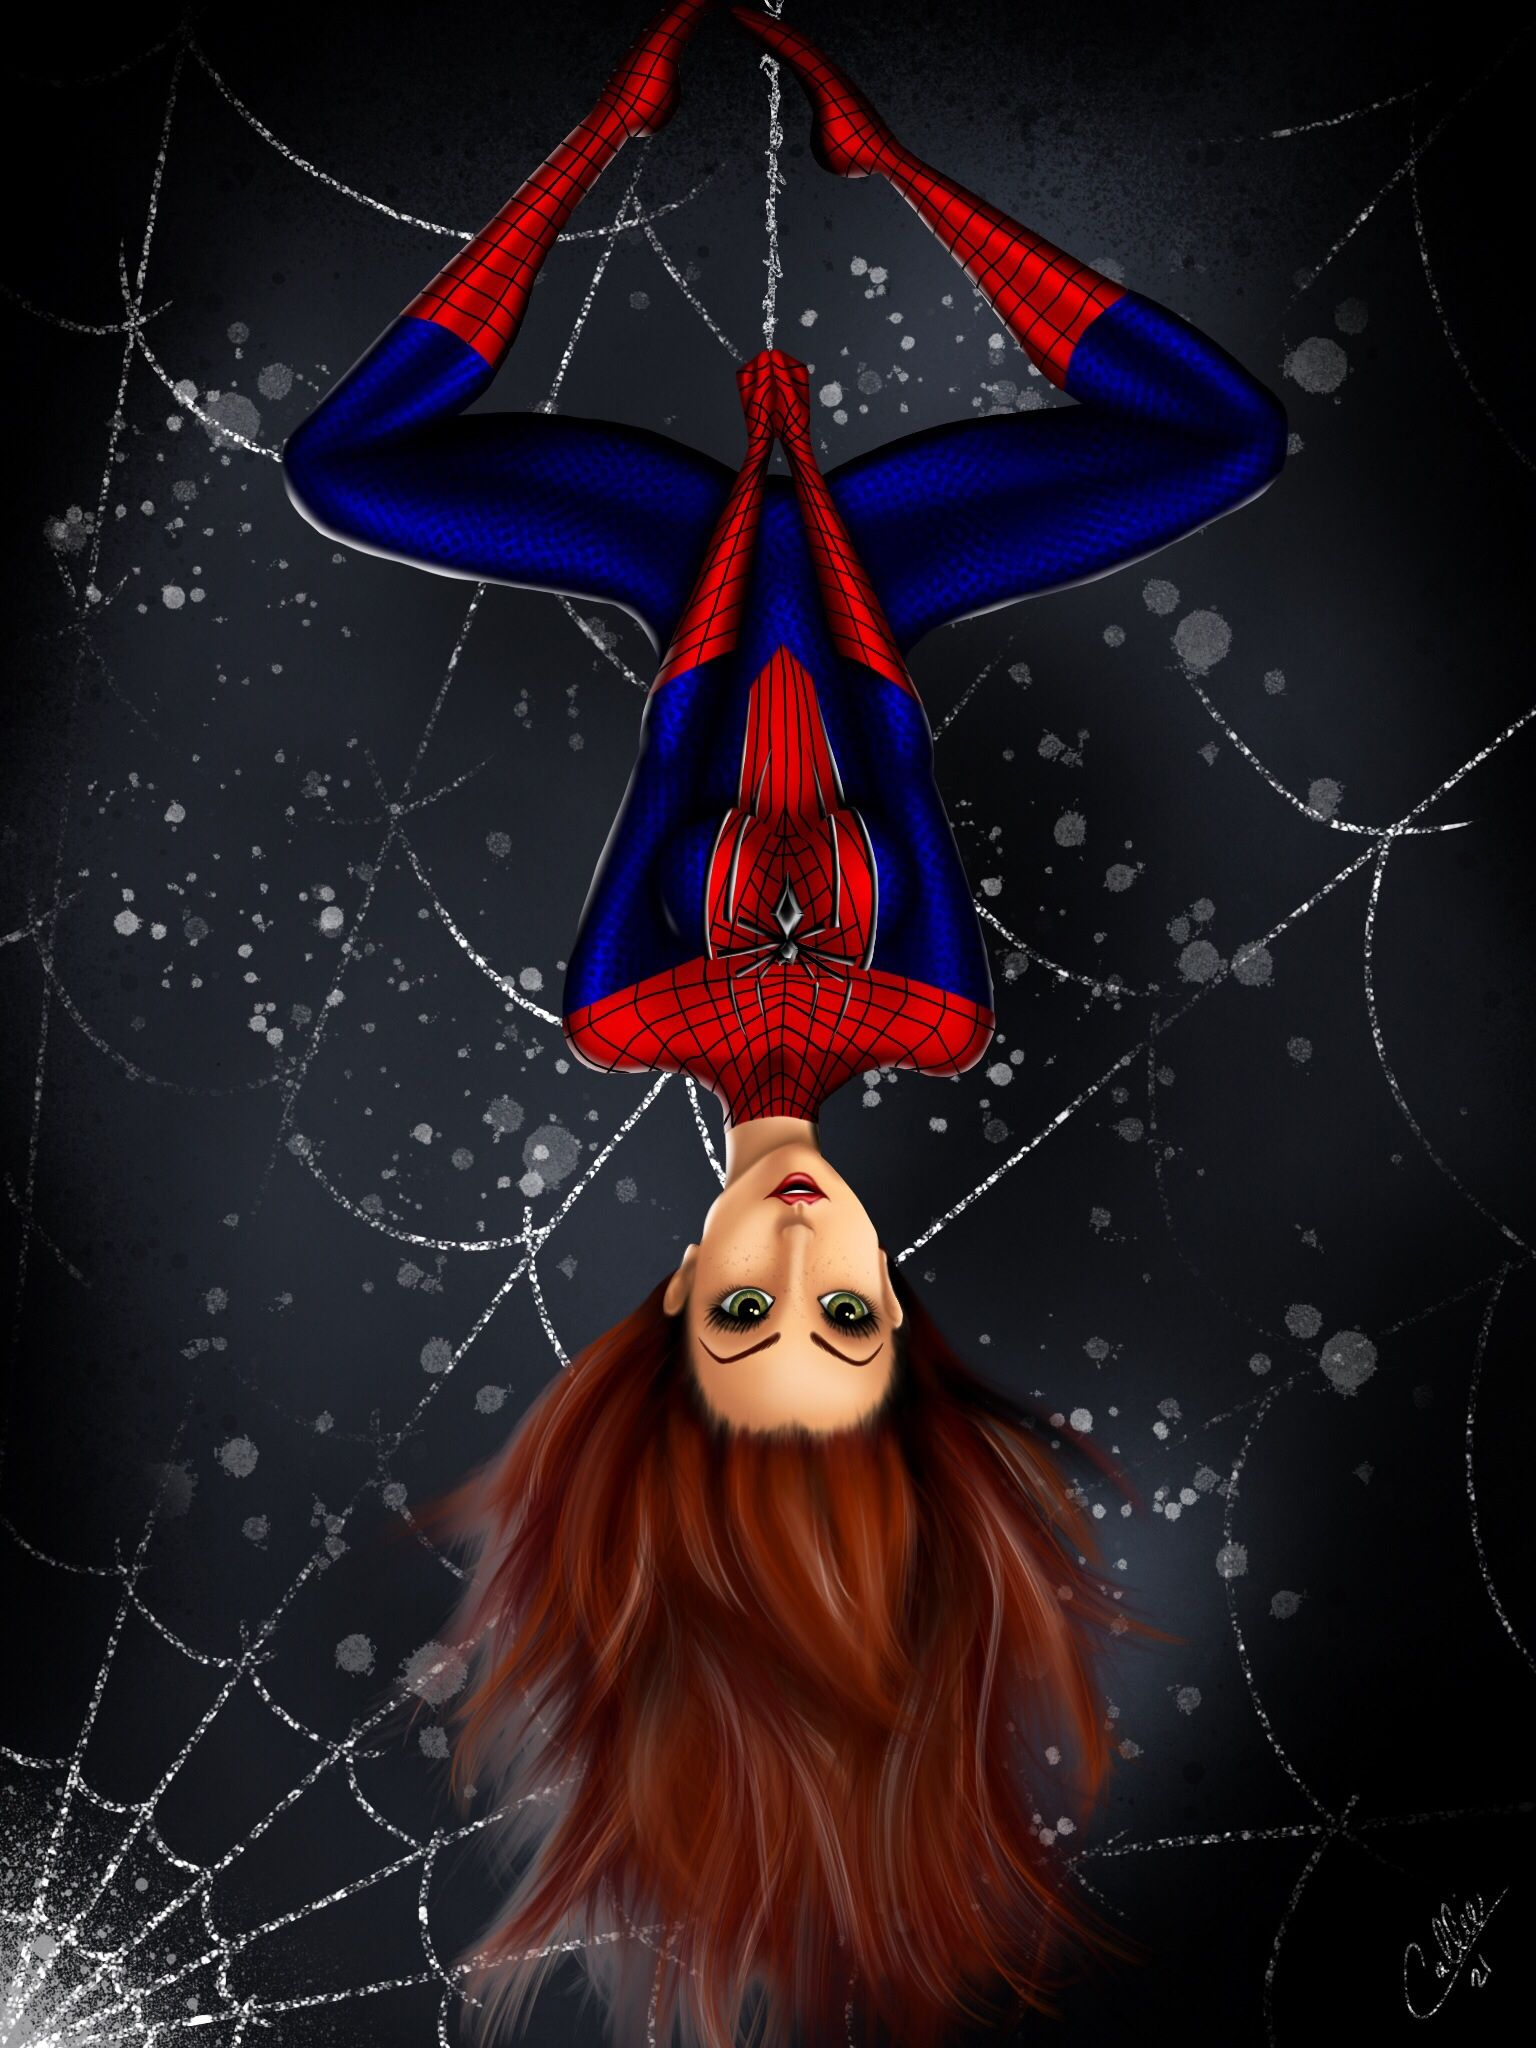 CFC|Spiderman vs. Ladybug by VEXIKKU on DeviantArt